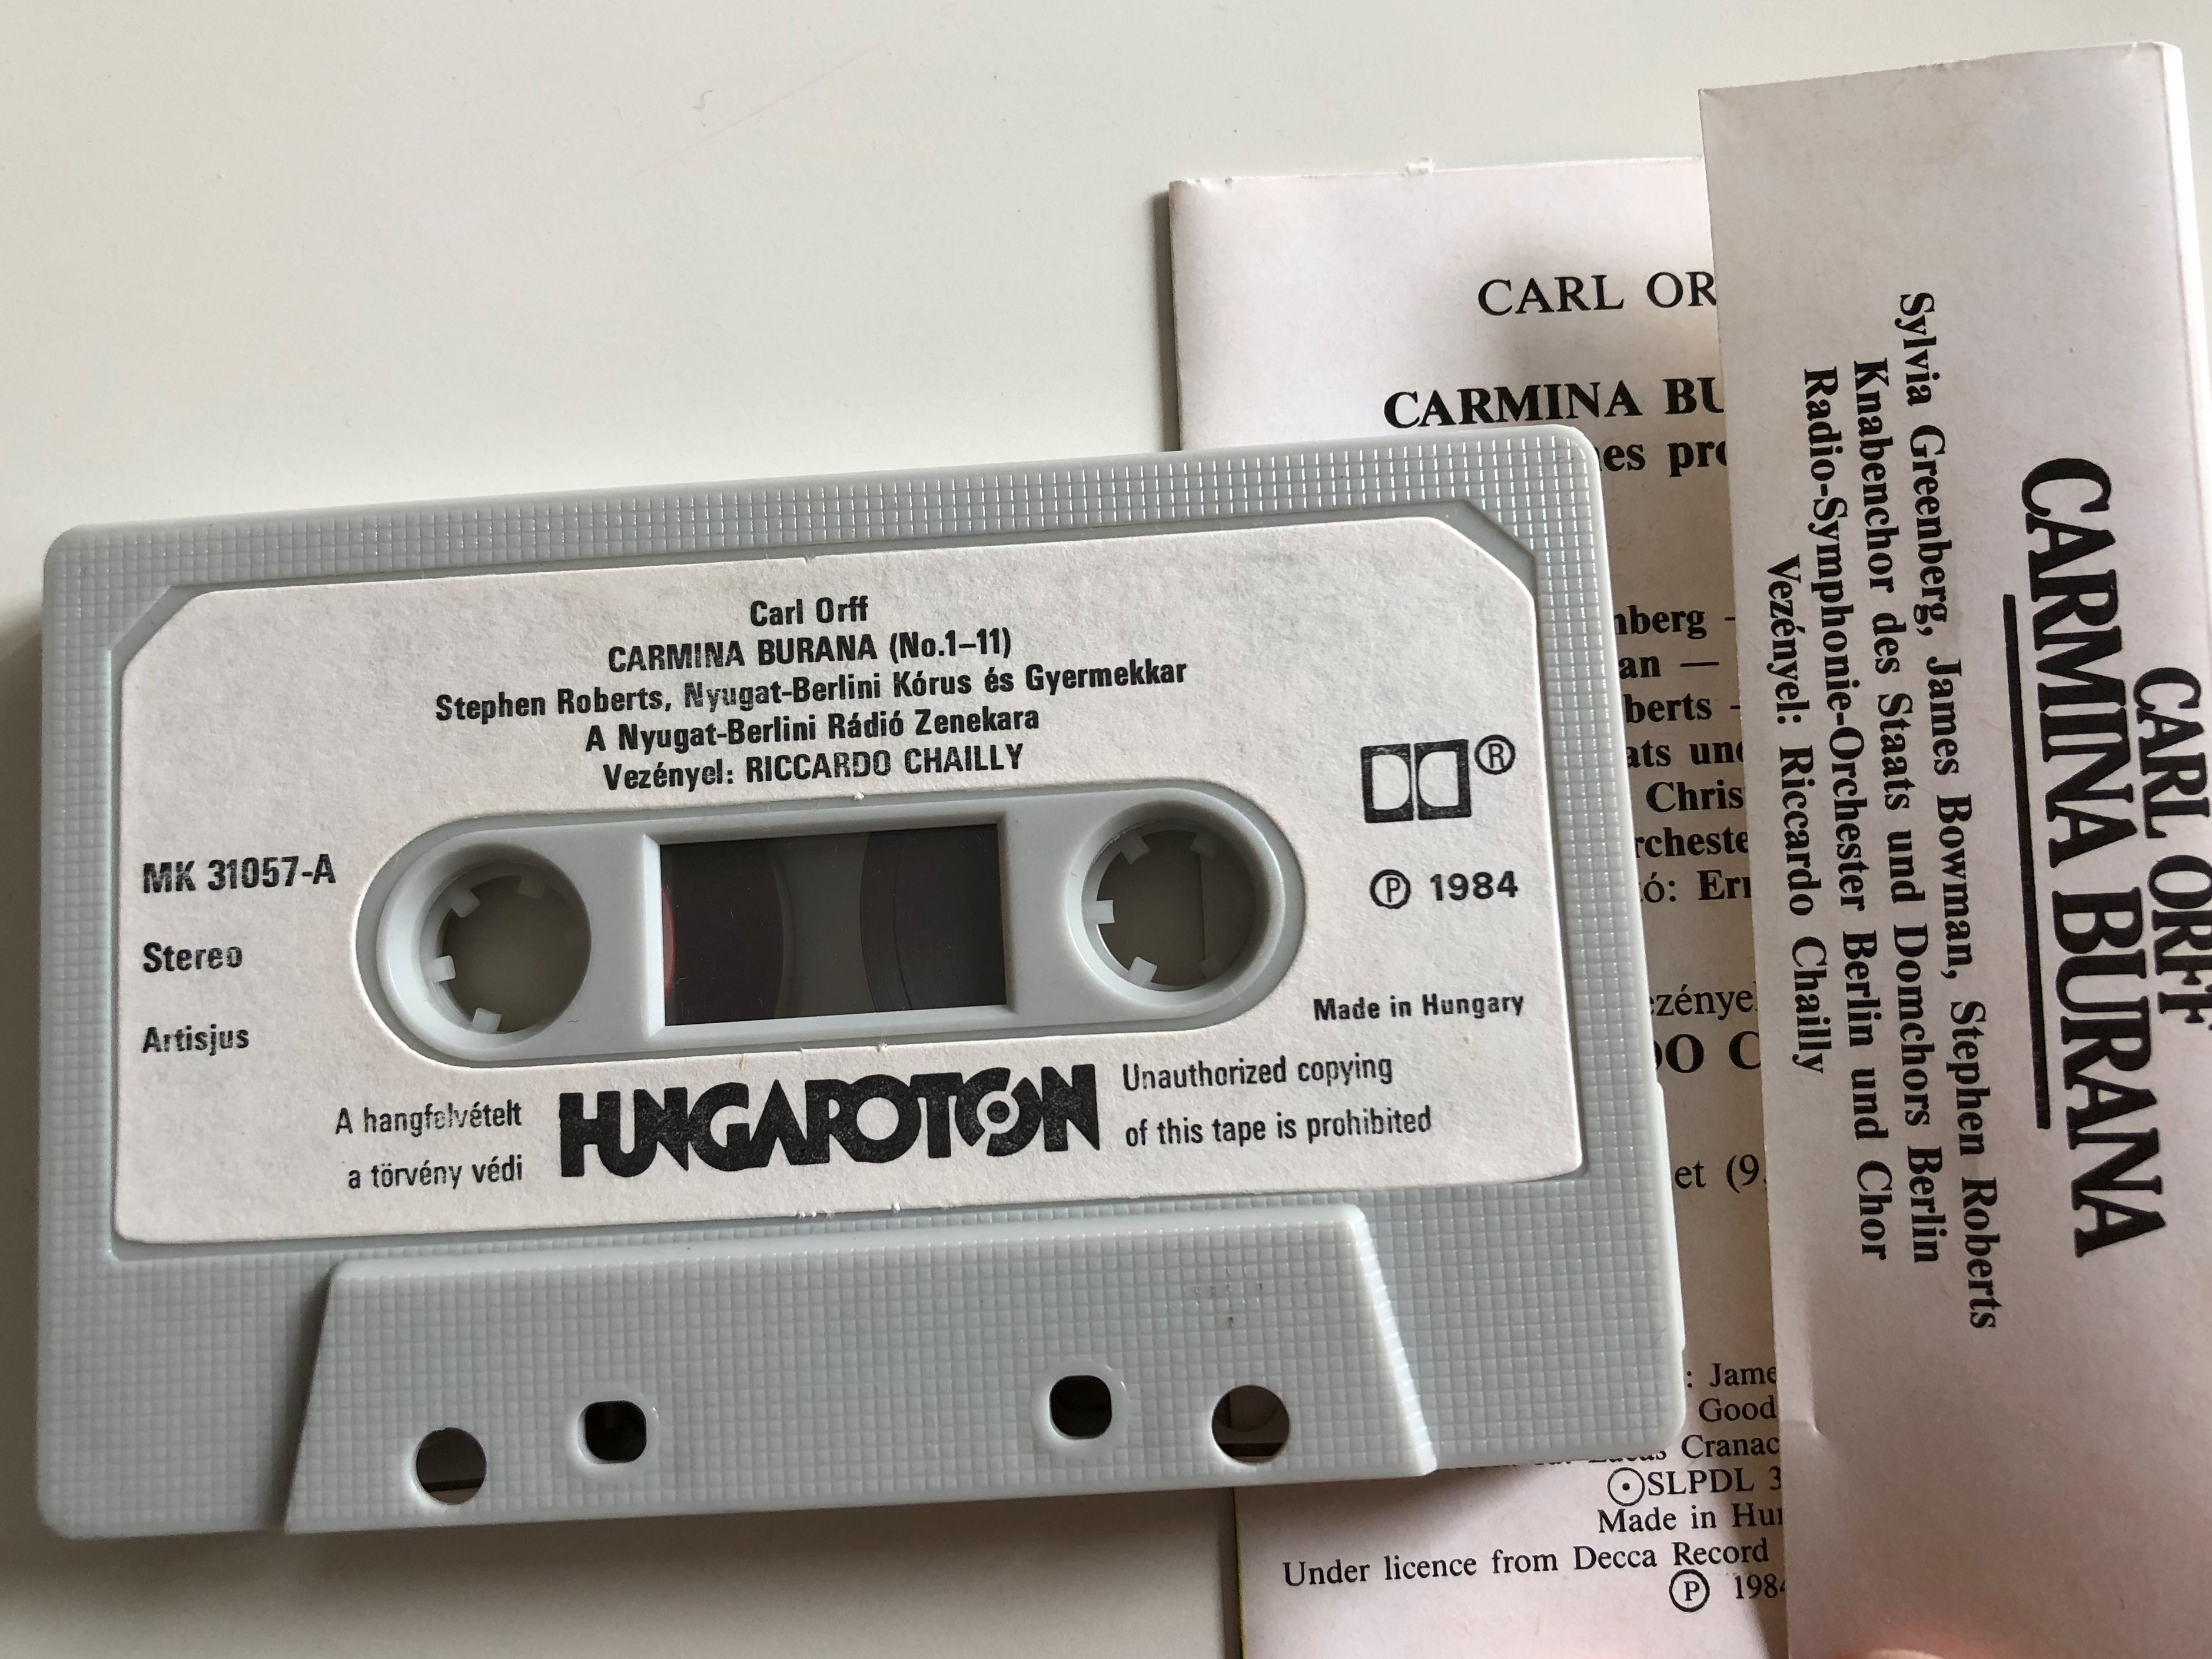 carl-orff-carmina-burana-sylvia-greenberg-james-bowman-stephen-roberts-rso-berlin-und-chor-conducted-riccardo-chailly-hungaroton-cassette-stereo-mkl-31057-3-.jpg